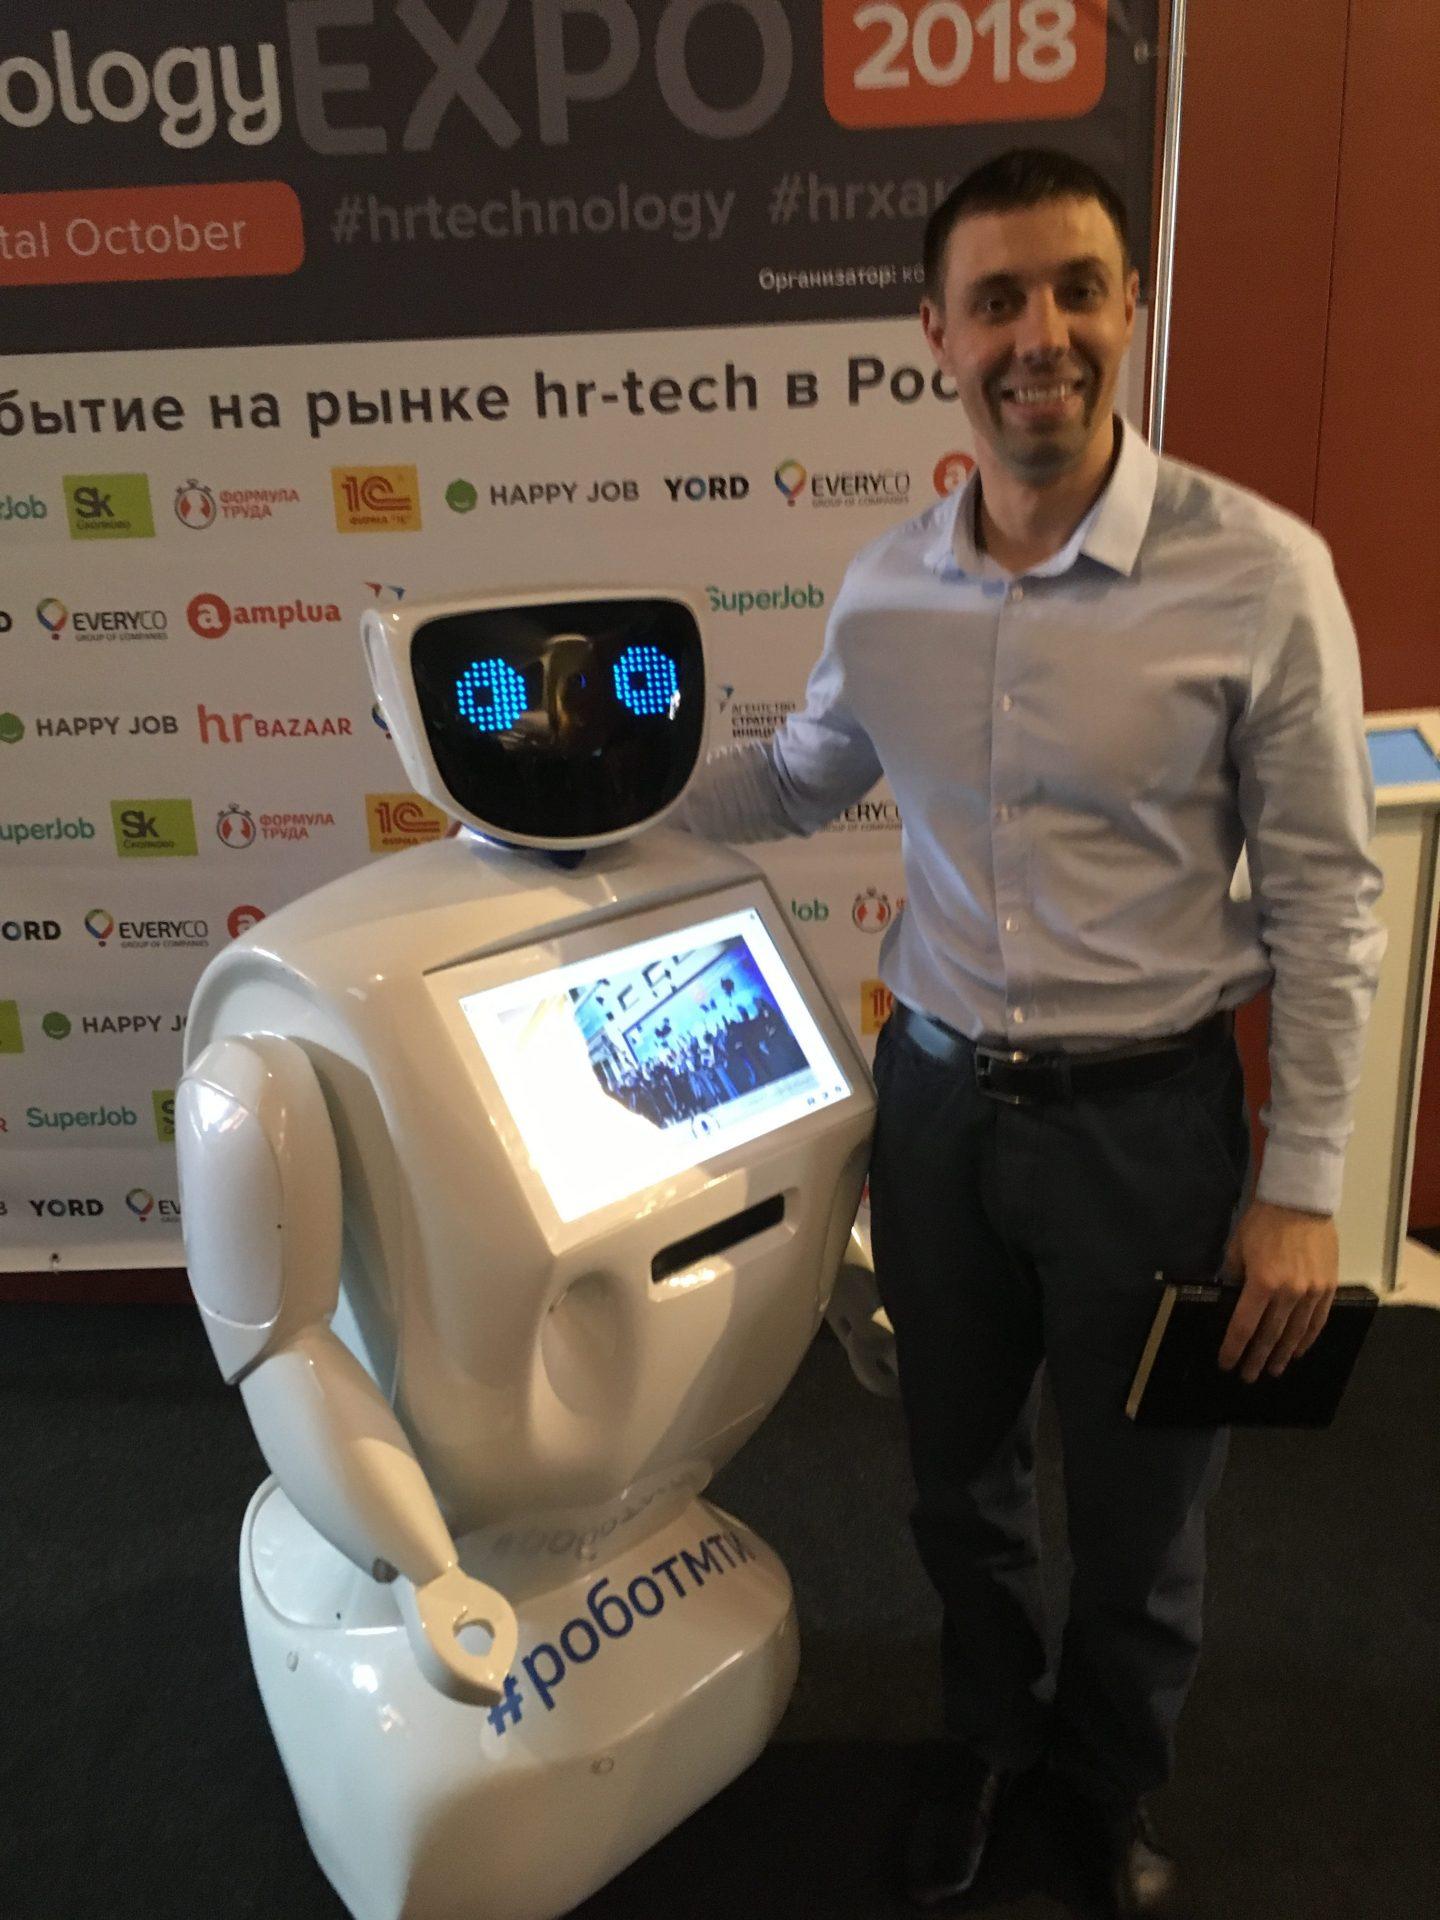 Посетили форум HR ТECH 2018 (роботизация HR) - картинка hr-tech-02-e1542361838558